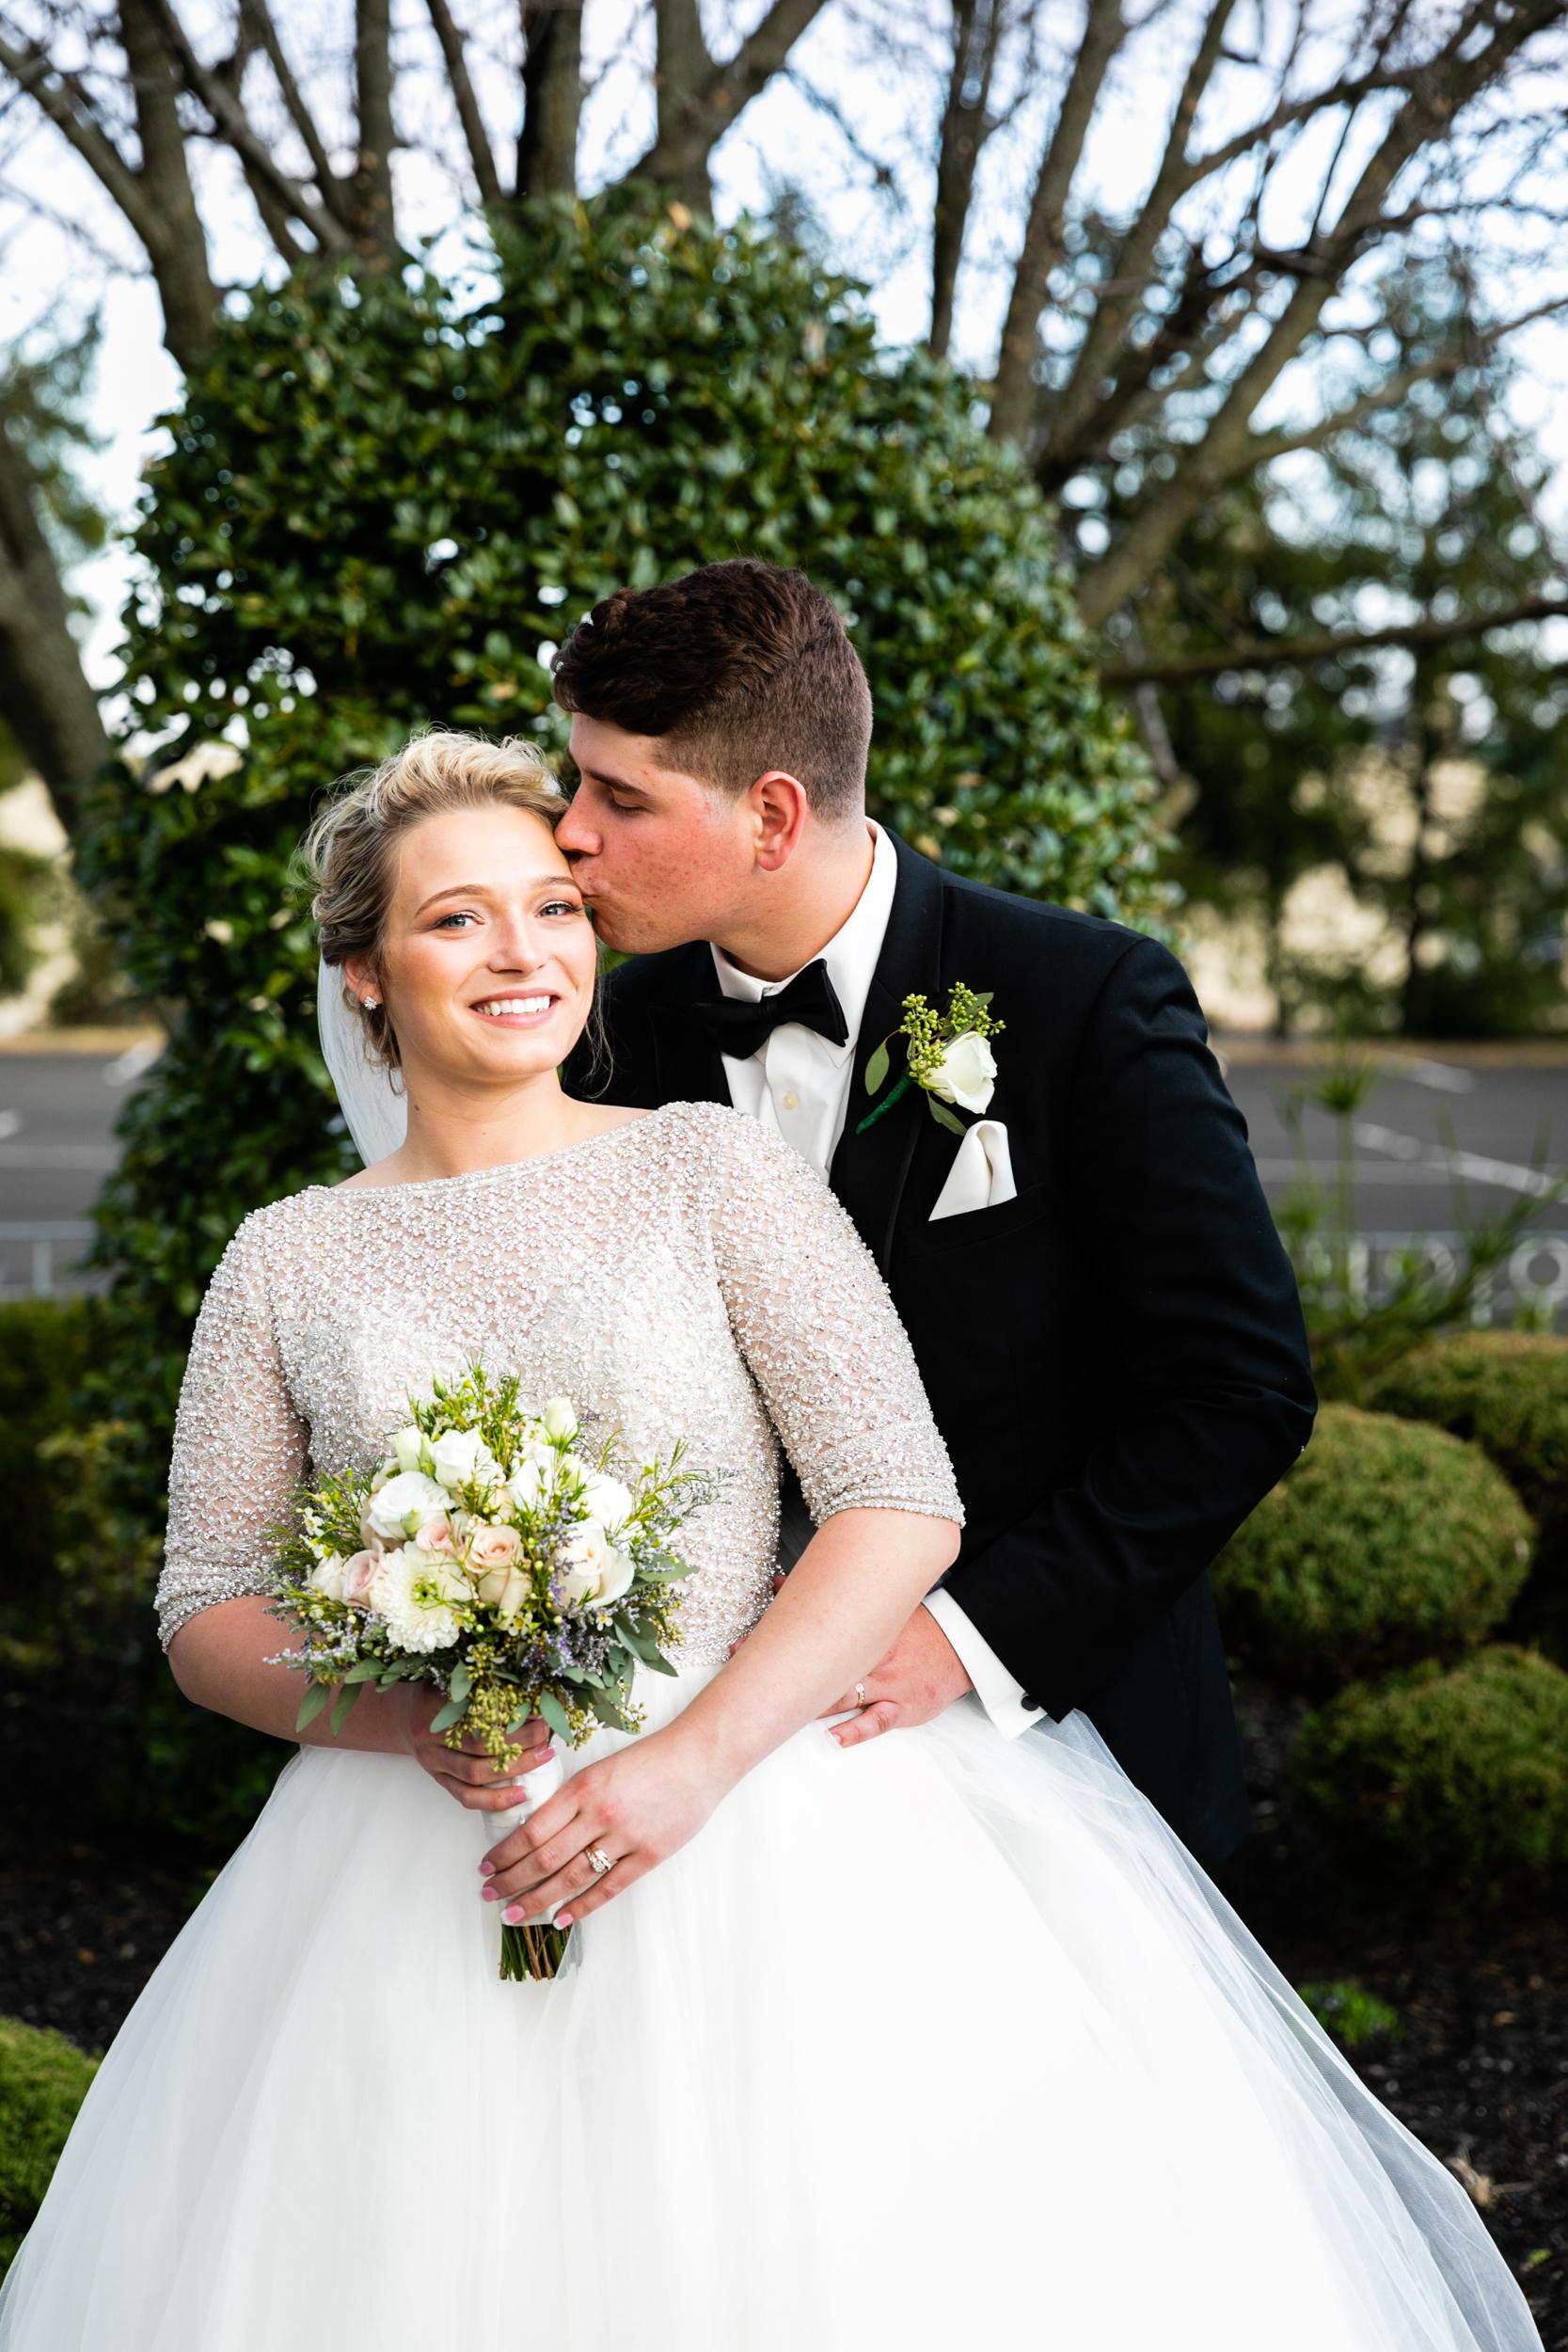 CELEBRATIONS BENSALEM WEDDING PHOTOGRAPHY-68.jpg